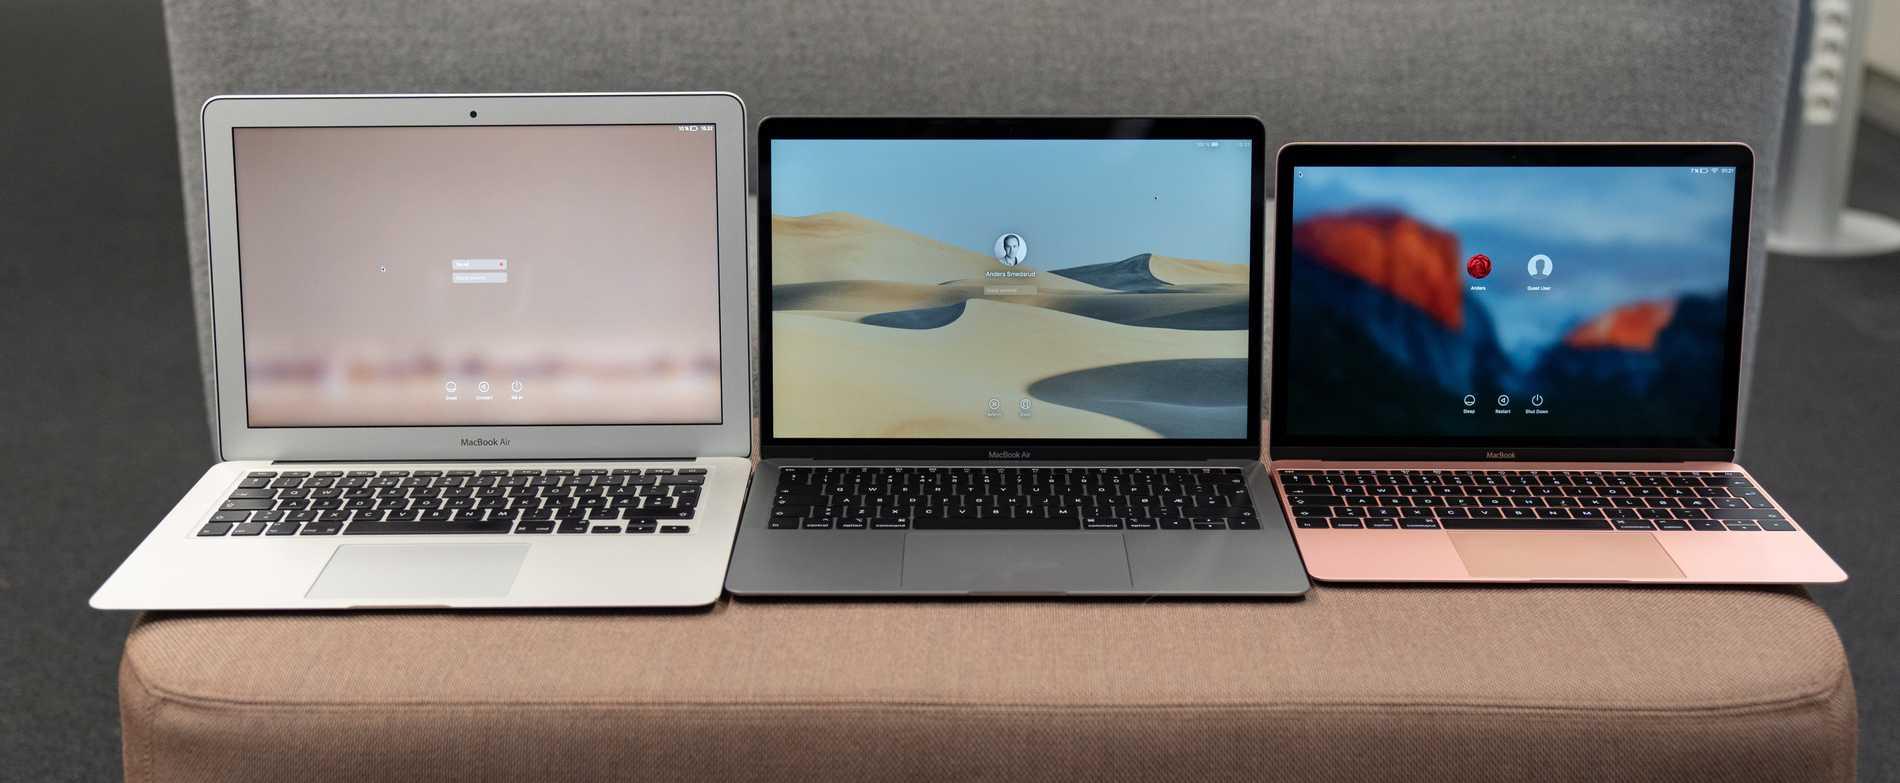 Tripp trapp trull. Gamla Macbook Air 13, nya Macbook Air 13 och Macbook 12.